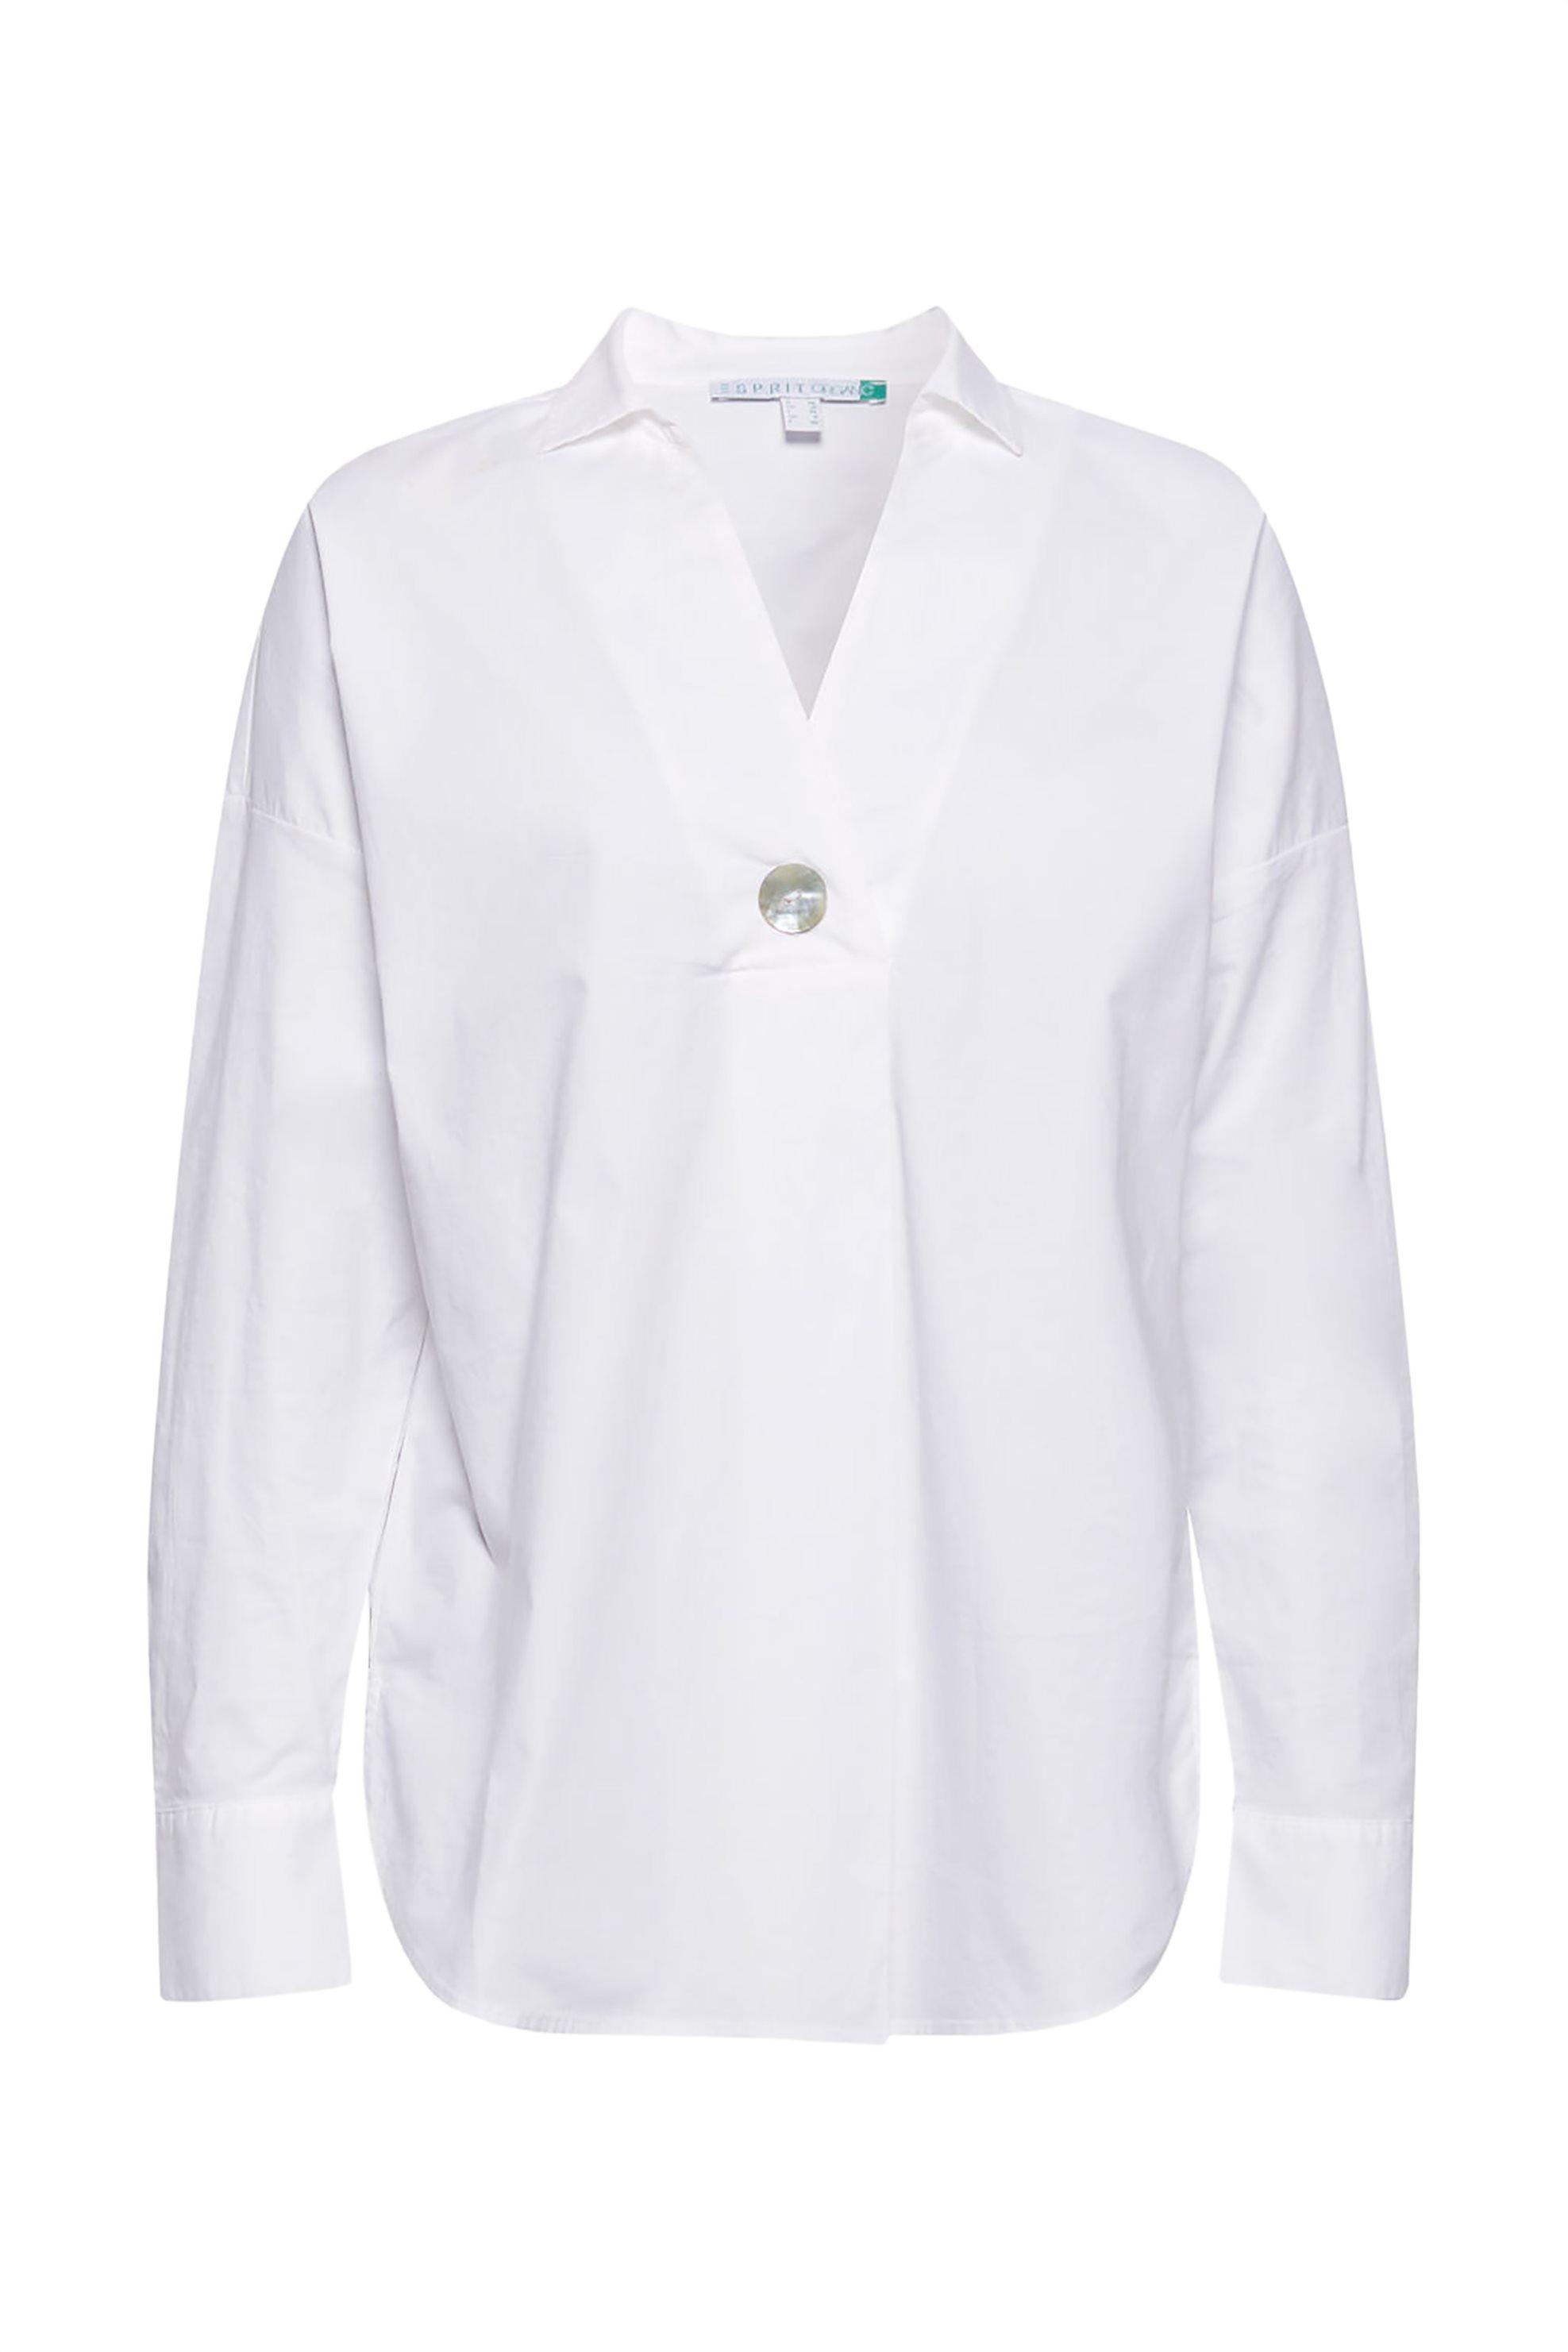 Esprit γυναικεία μονόχρωμη πουκαμίσα με κουμπί - 029EE1F022 - Λευκό γυναικα   ρουχα   tops   πουκάμισα   πουκαμίσες   καφτάνια